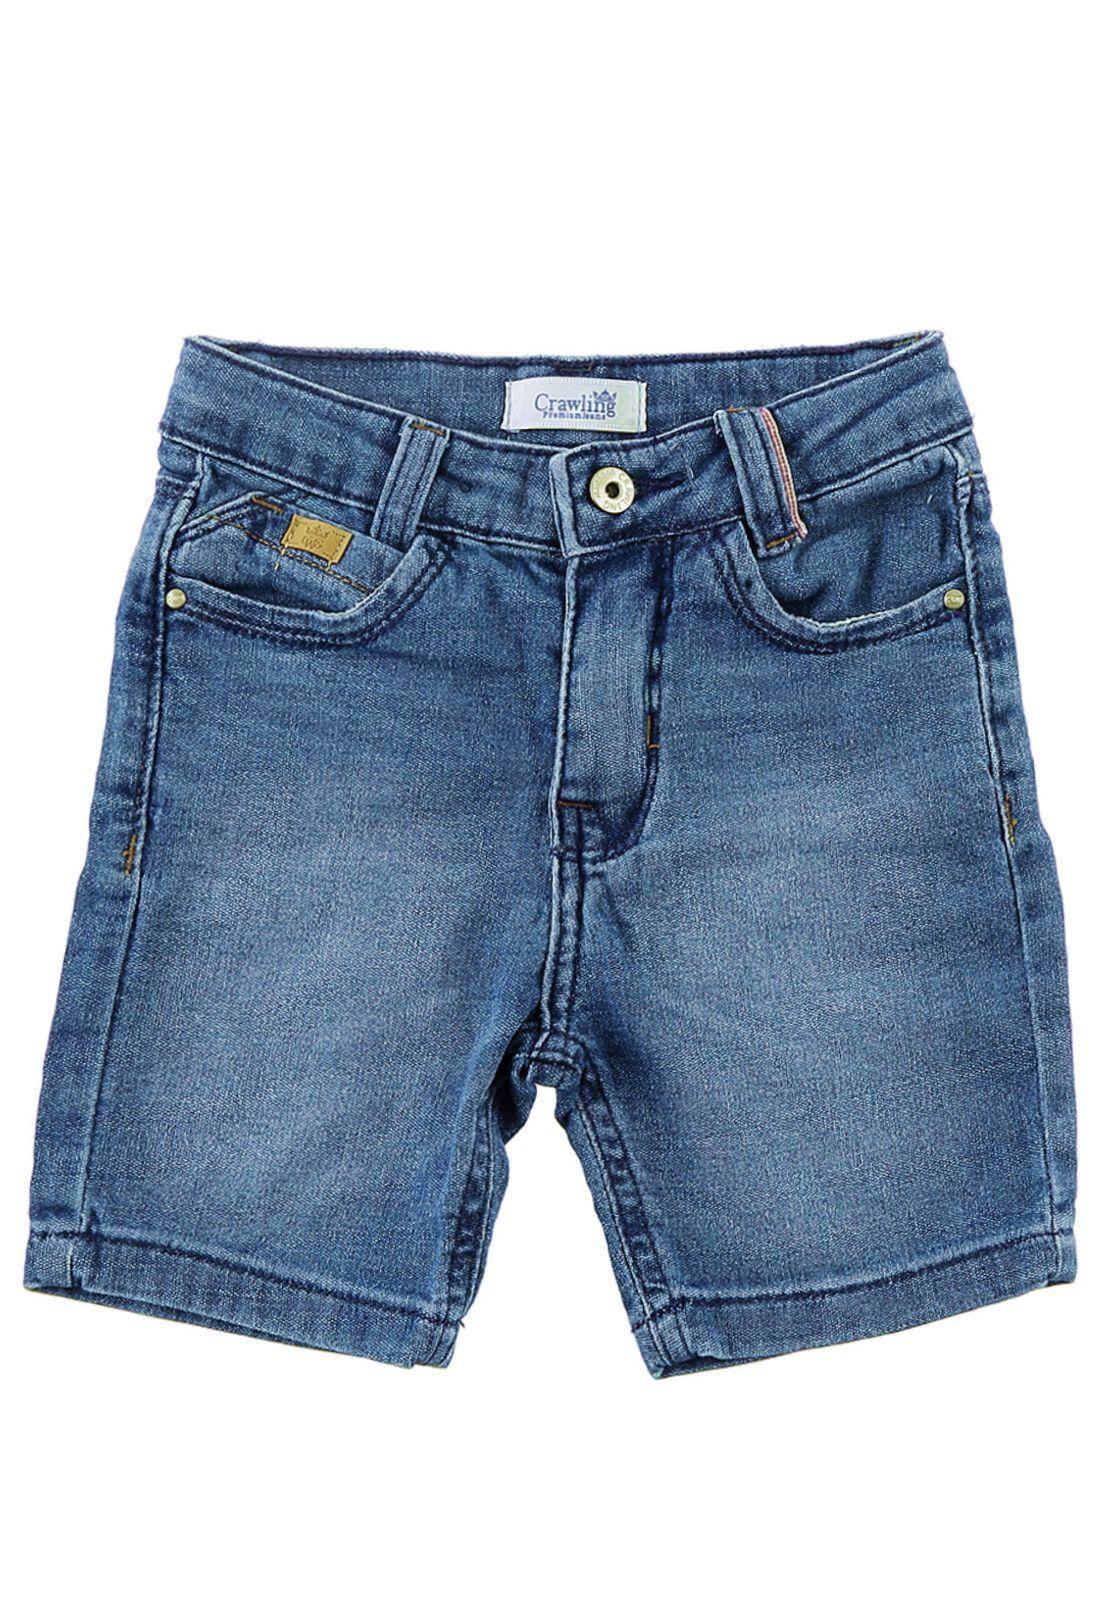 Bermuda Moletom Jeans Masculina Bebê Crawling